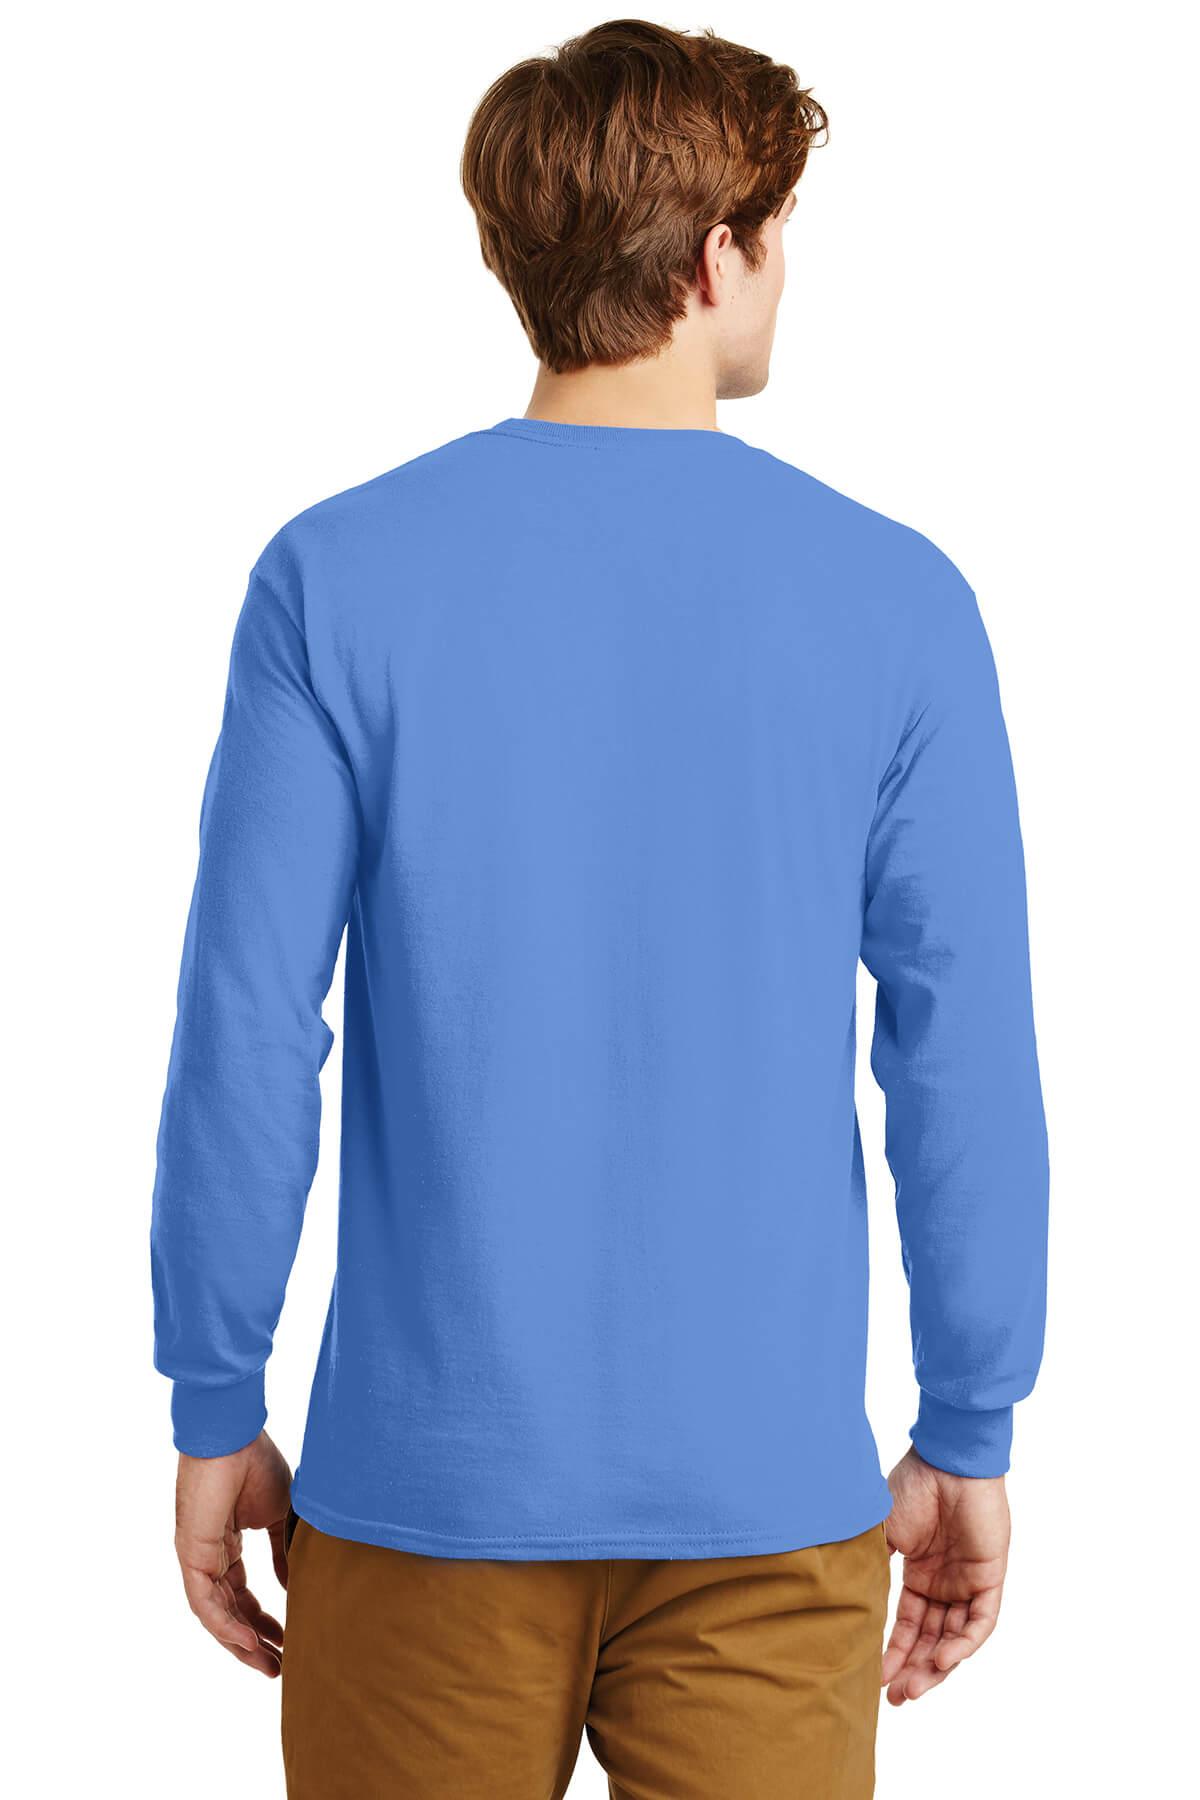 Blue Longsleeve Tee Model Back